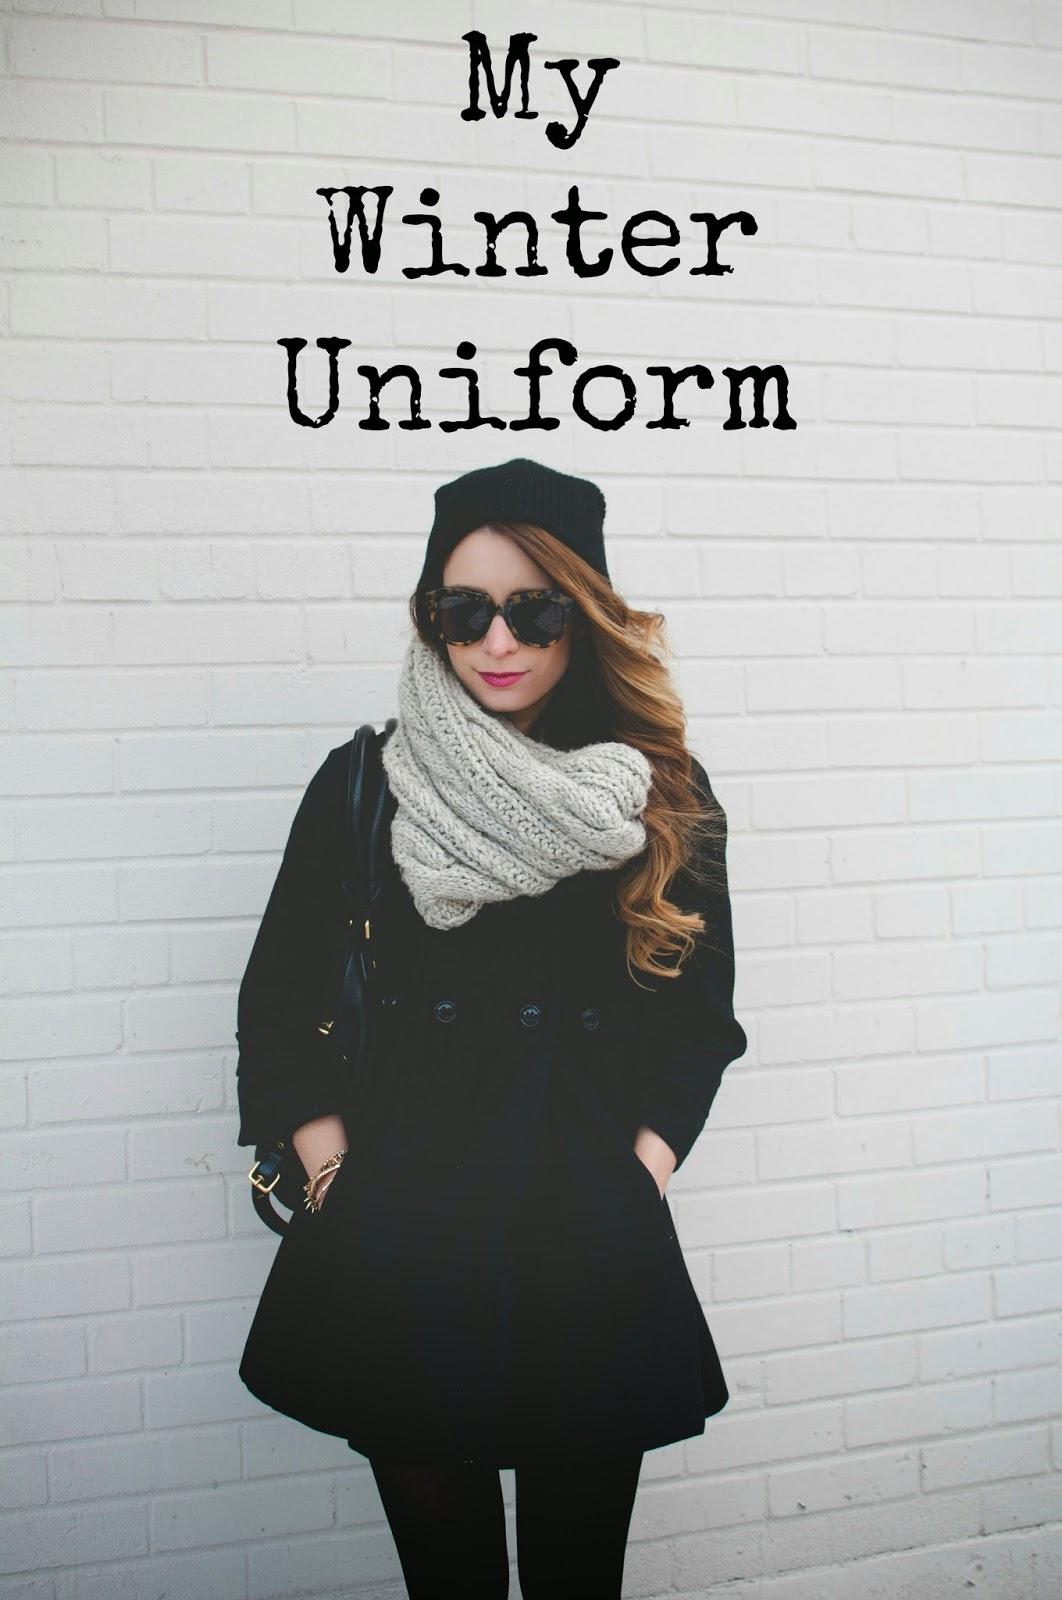 My Winter 2017 Capsule Wardrobe: My Winter Uniform - Winter OOTD